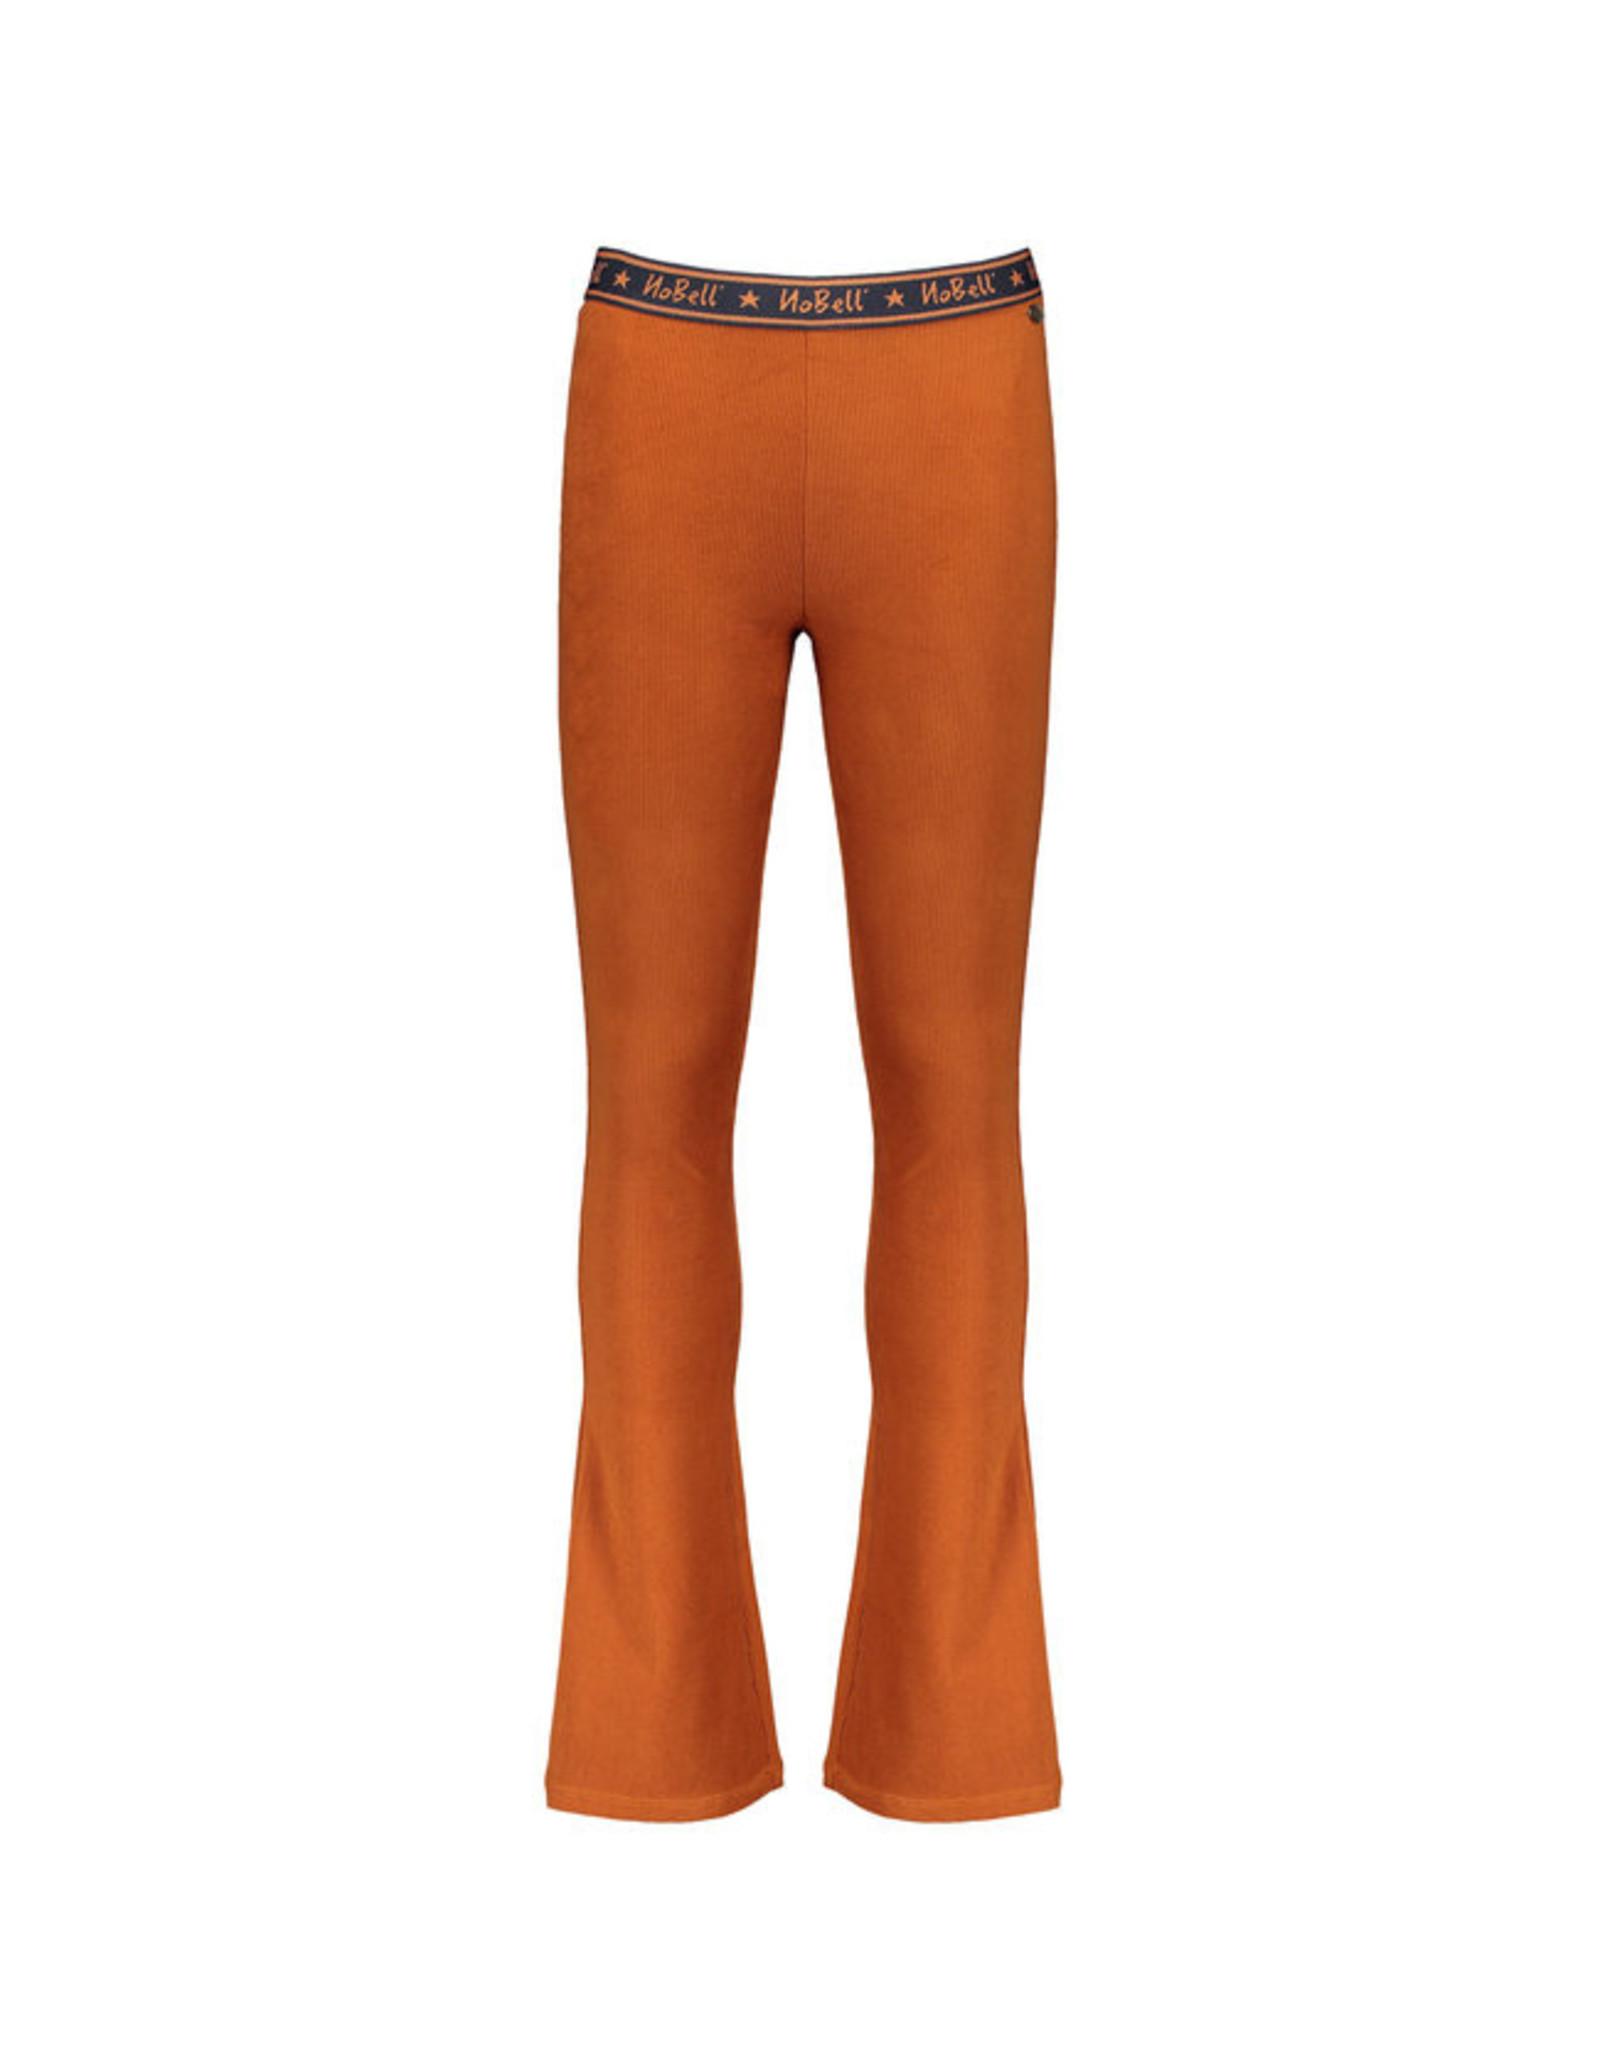 NoBell NoBell flared pants 3501 cinnamon